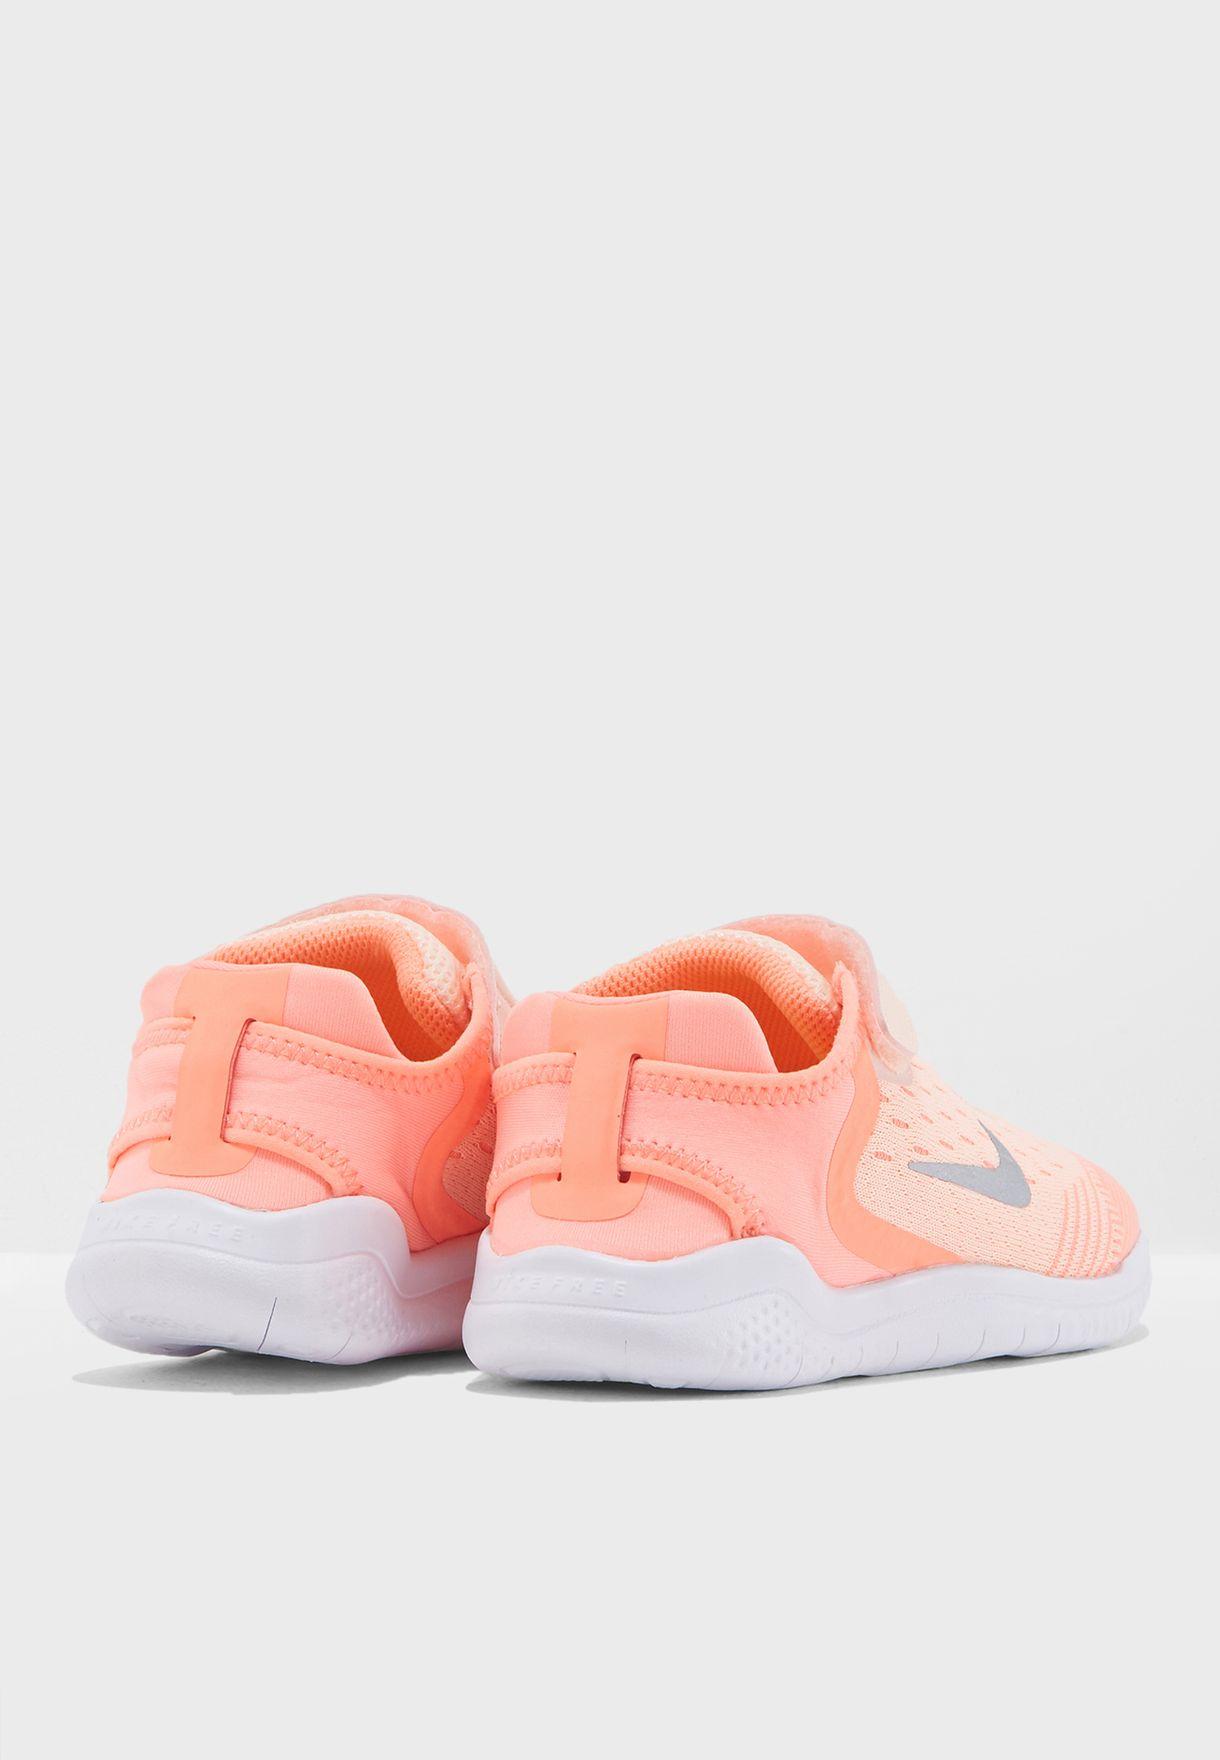 426e5ac24dfd Shop Nike pink Kids Free RN 2018 AH3455-800 for Kids in Saudi ...